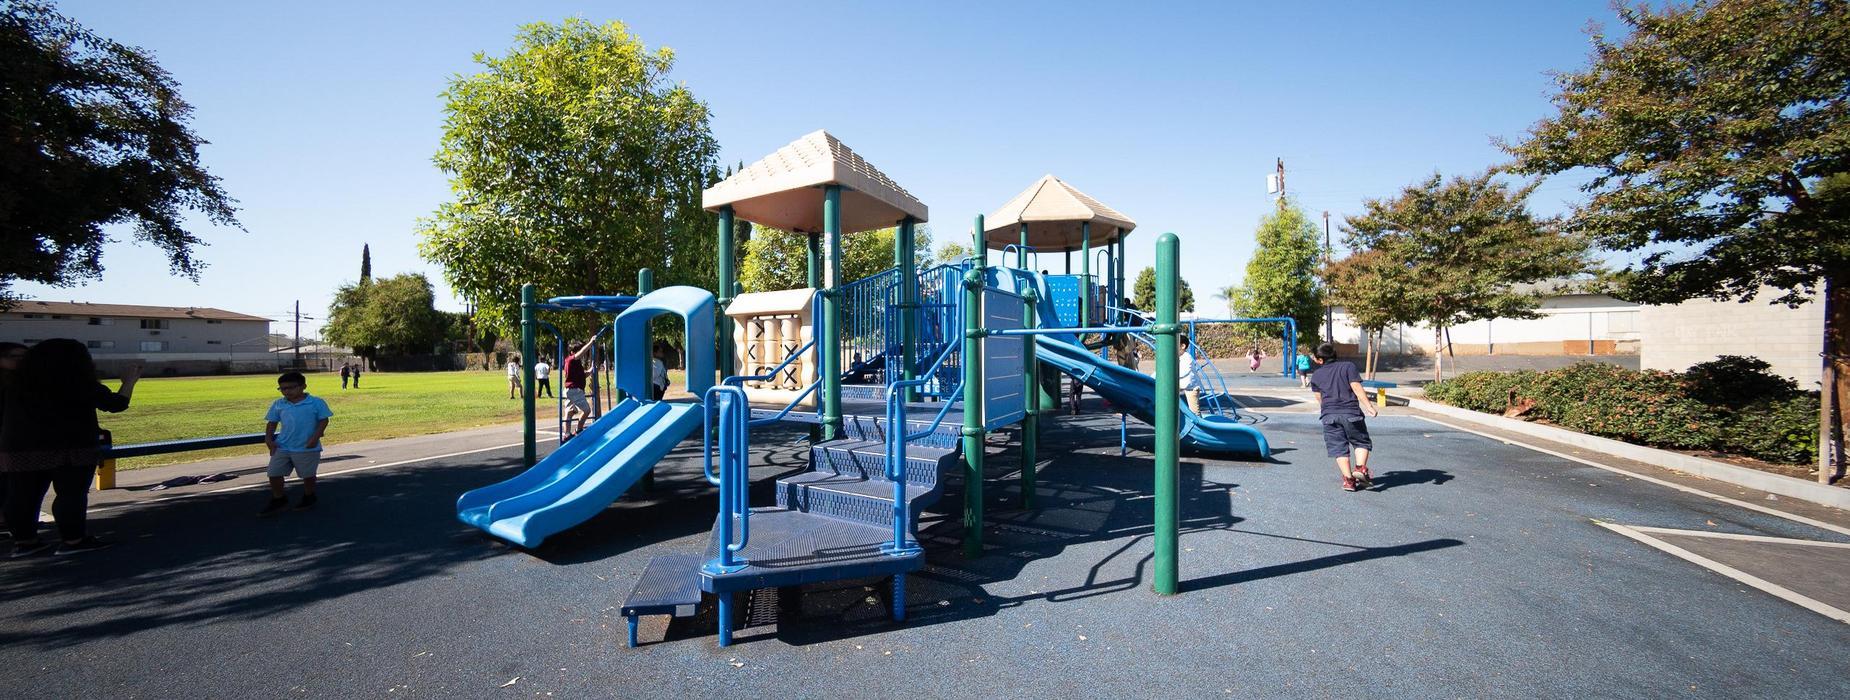 Northrup Playground during Recess